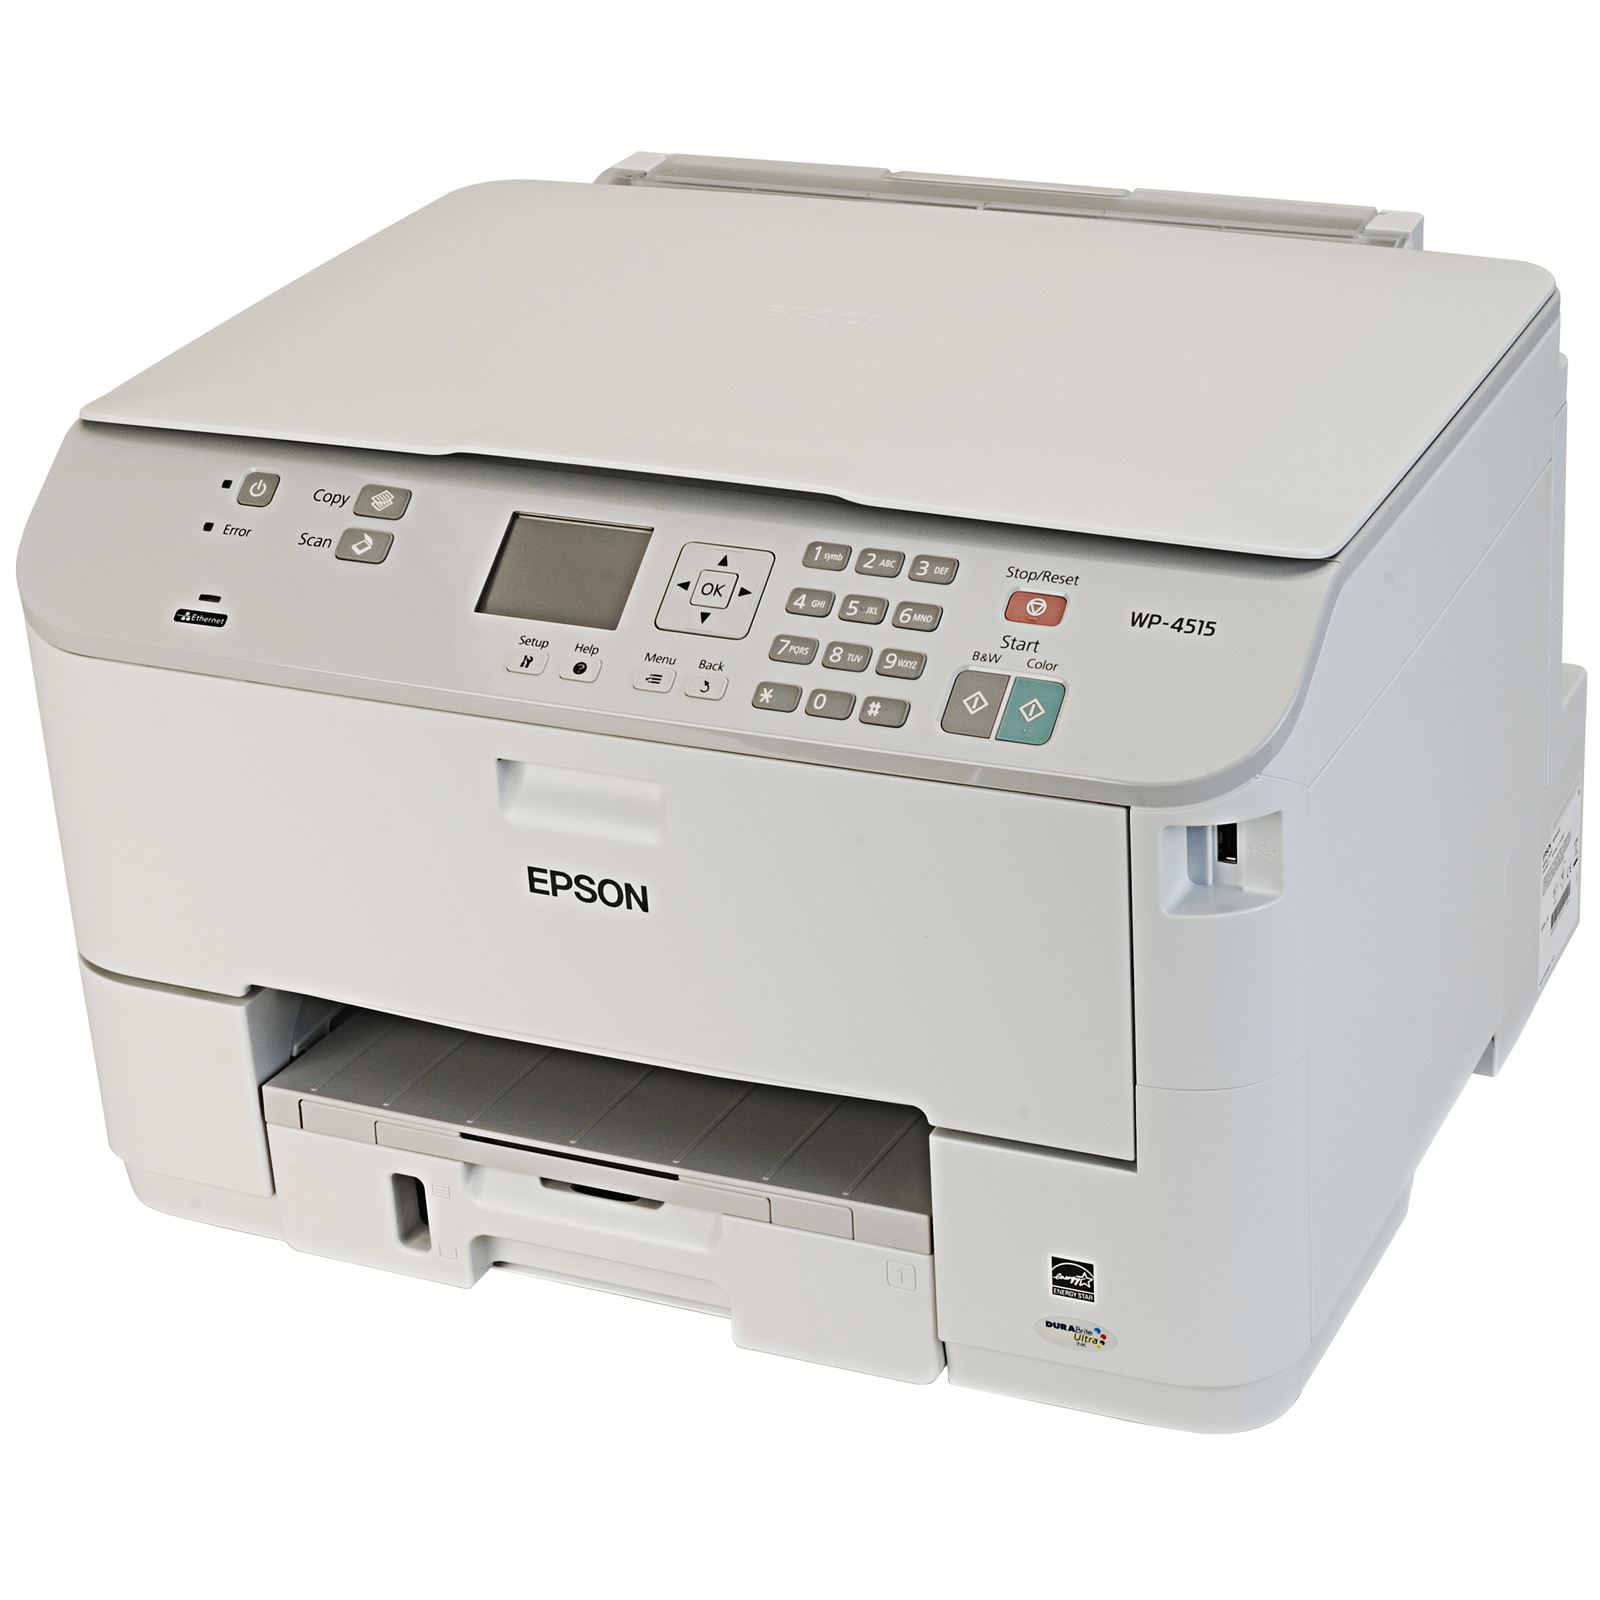 Epson WorkForce Pro WP 4515DN   экономичное МФУ для малого офиса